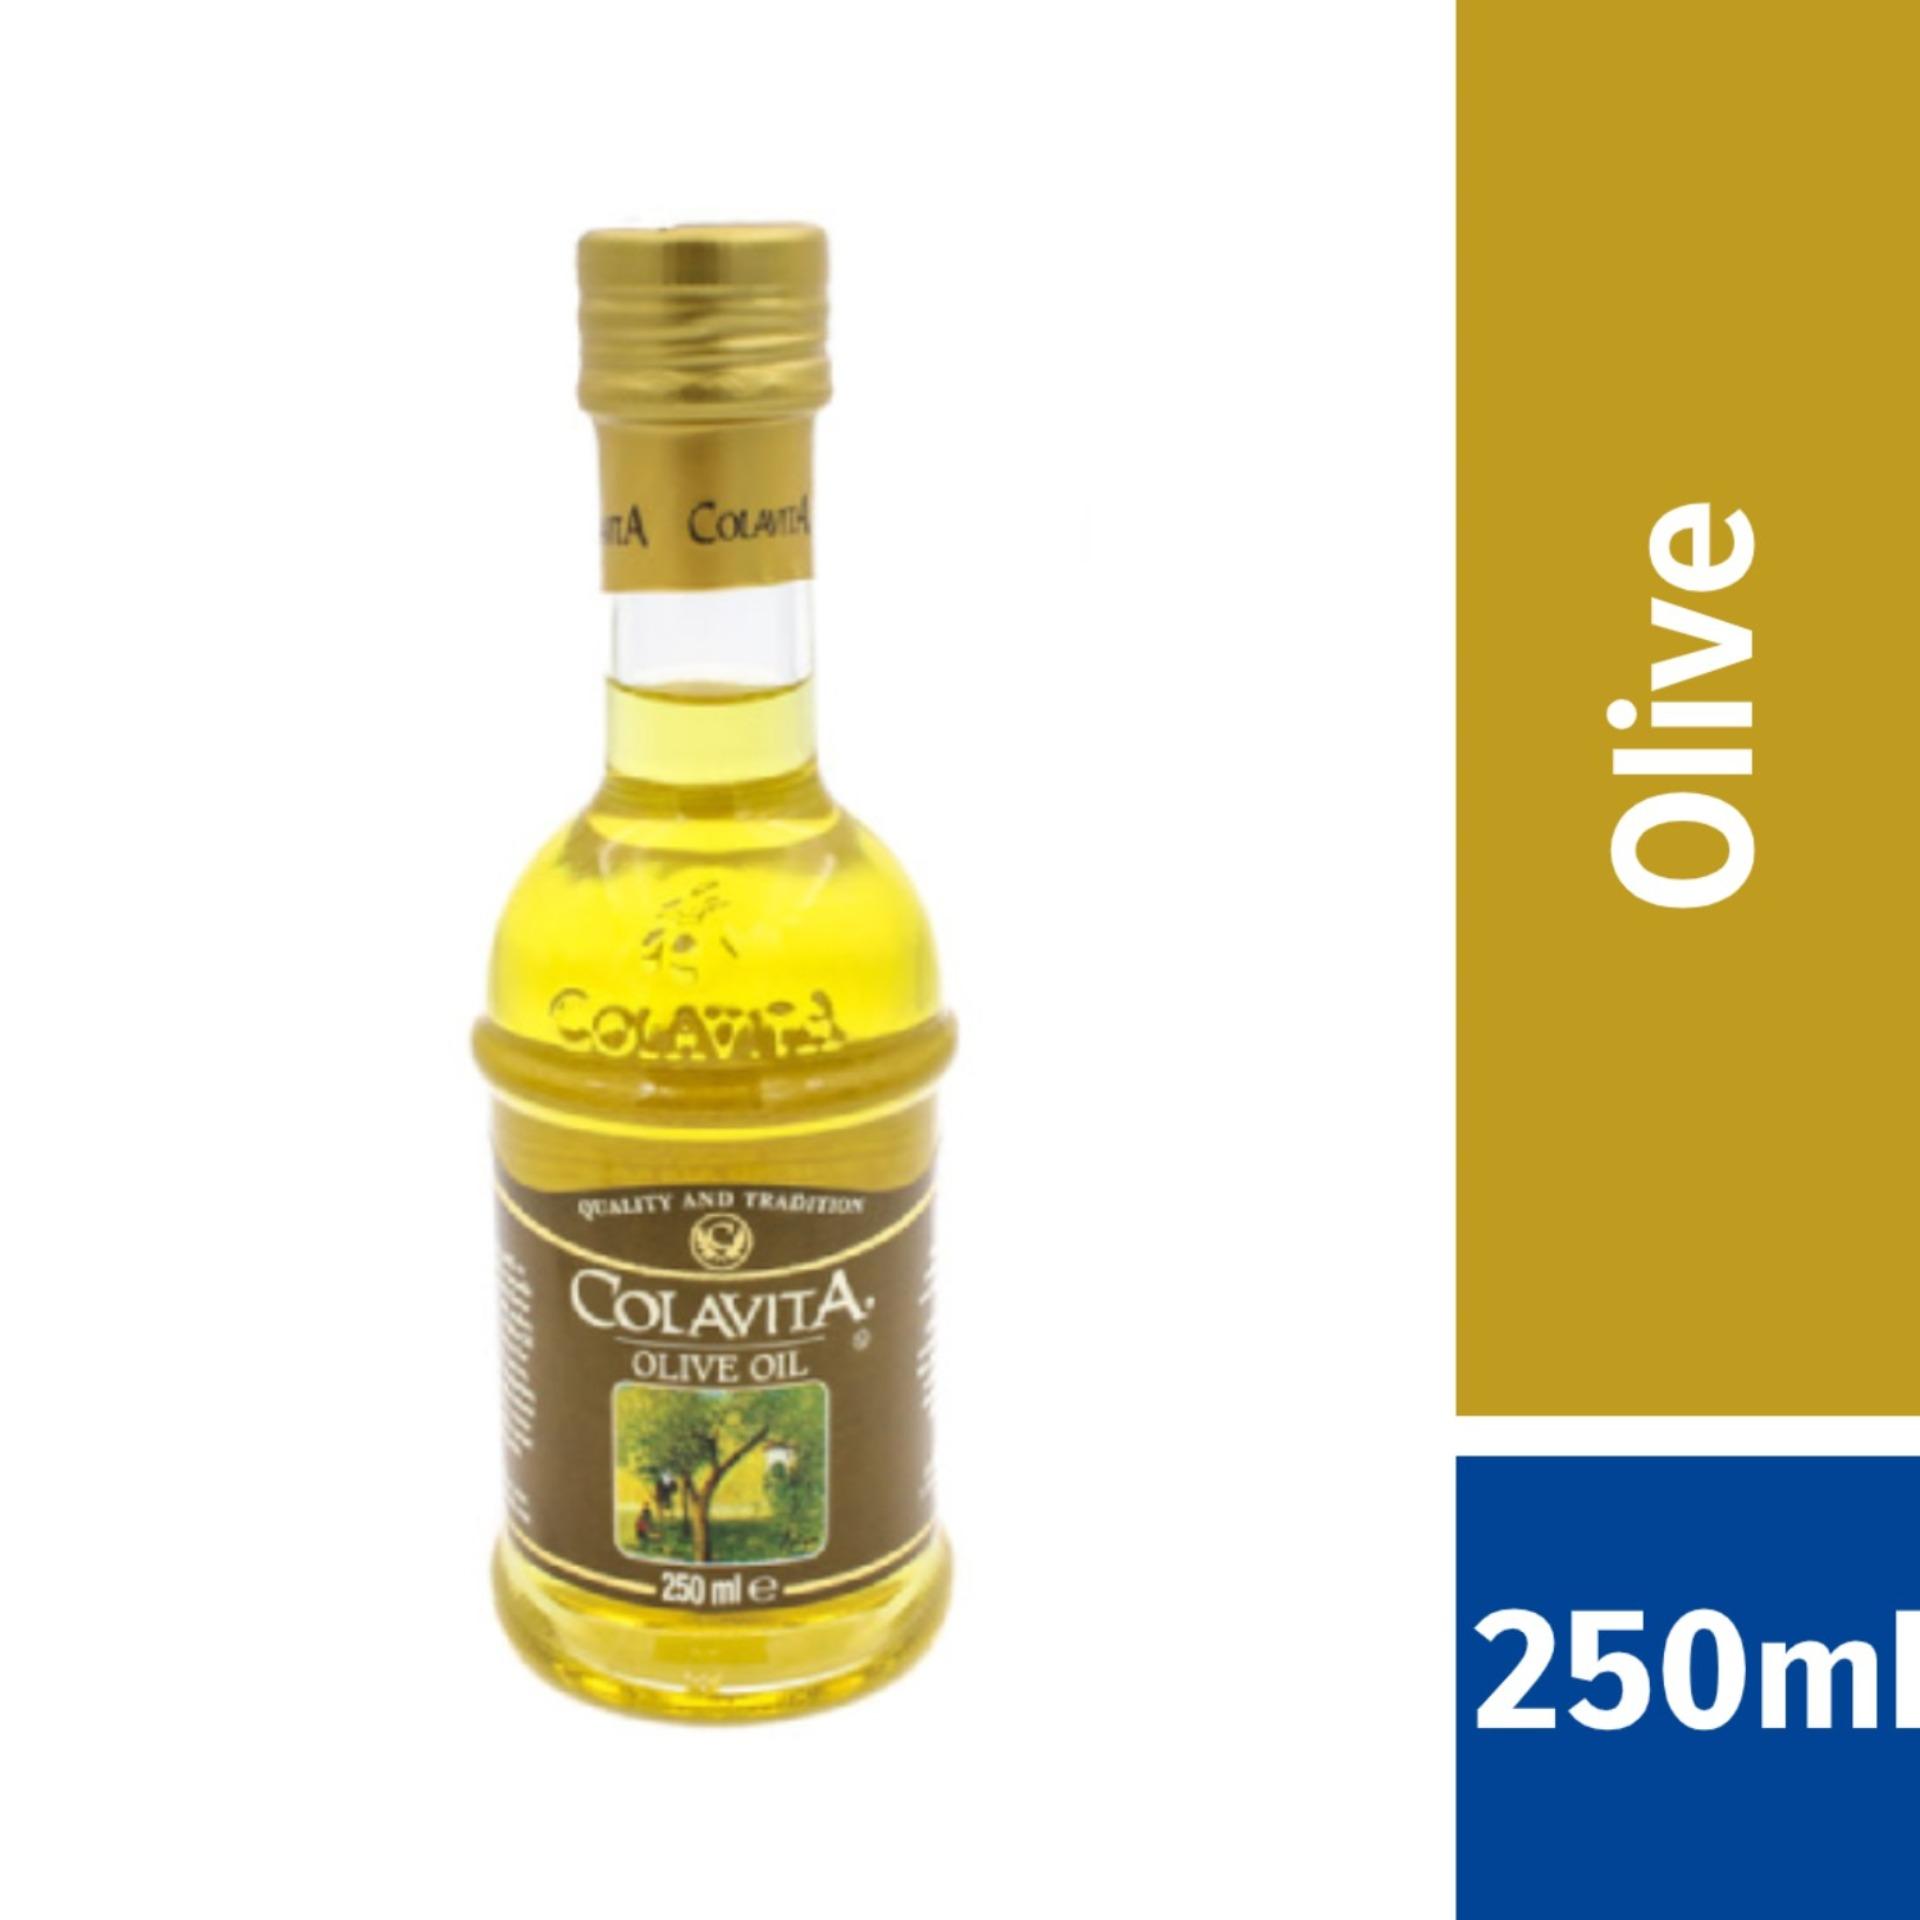 Dầu Oliu Colavita Olive oil 250ml- Nhập khẩu Ý